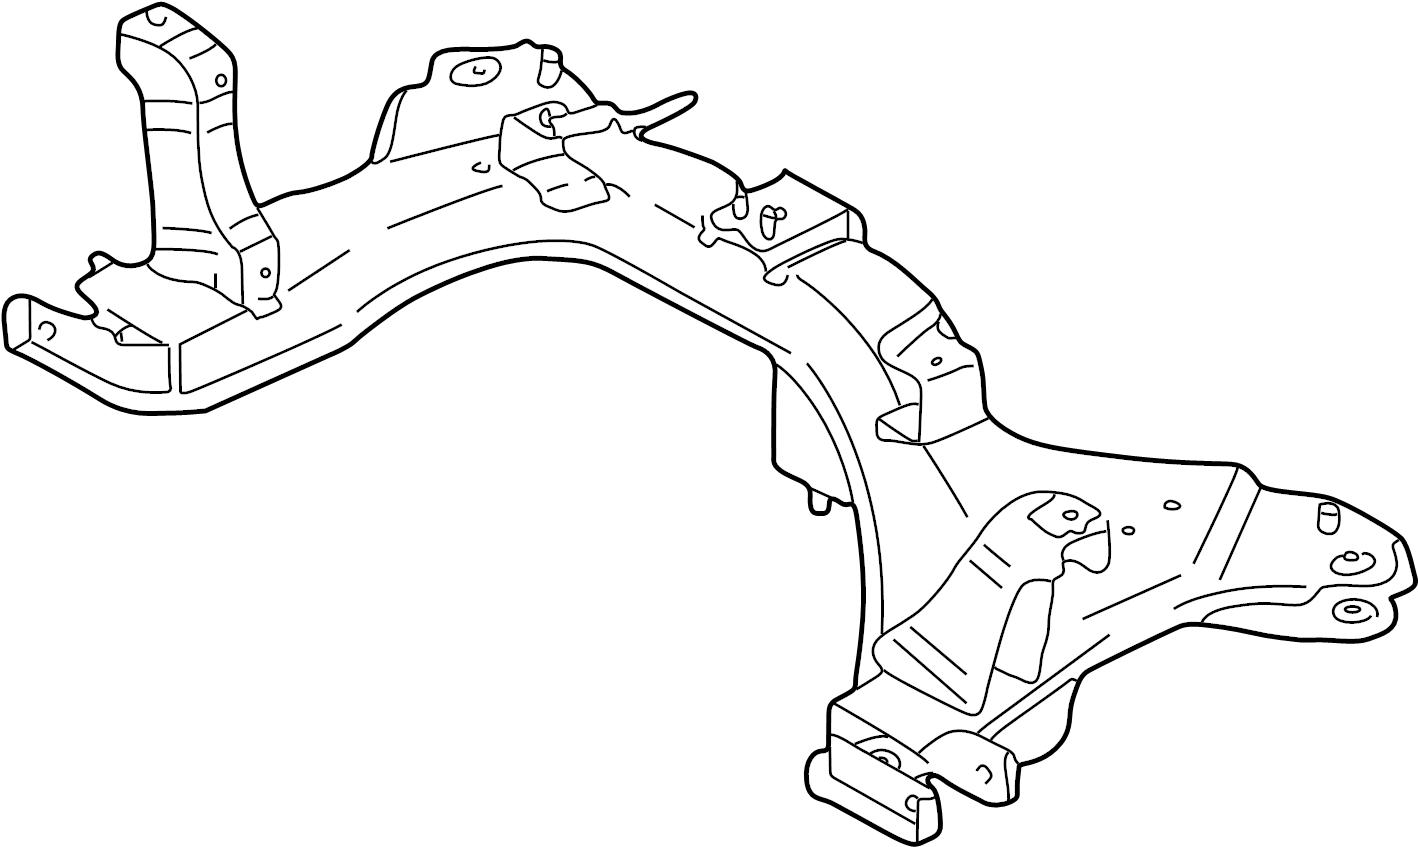 Mazda Tribute Crossmember Engine Cradle Can Not Order